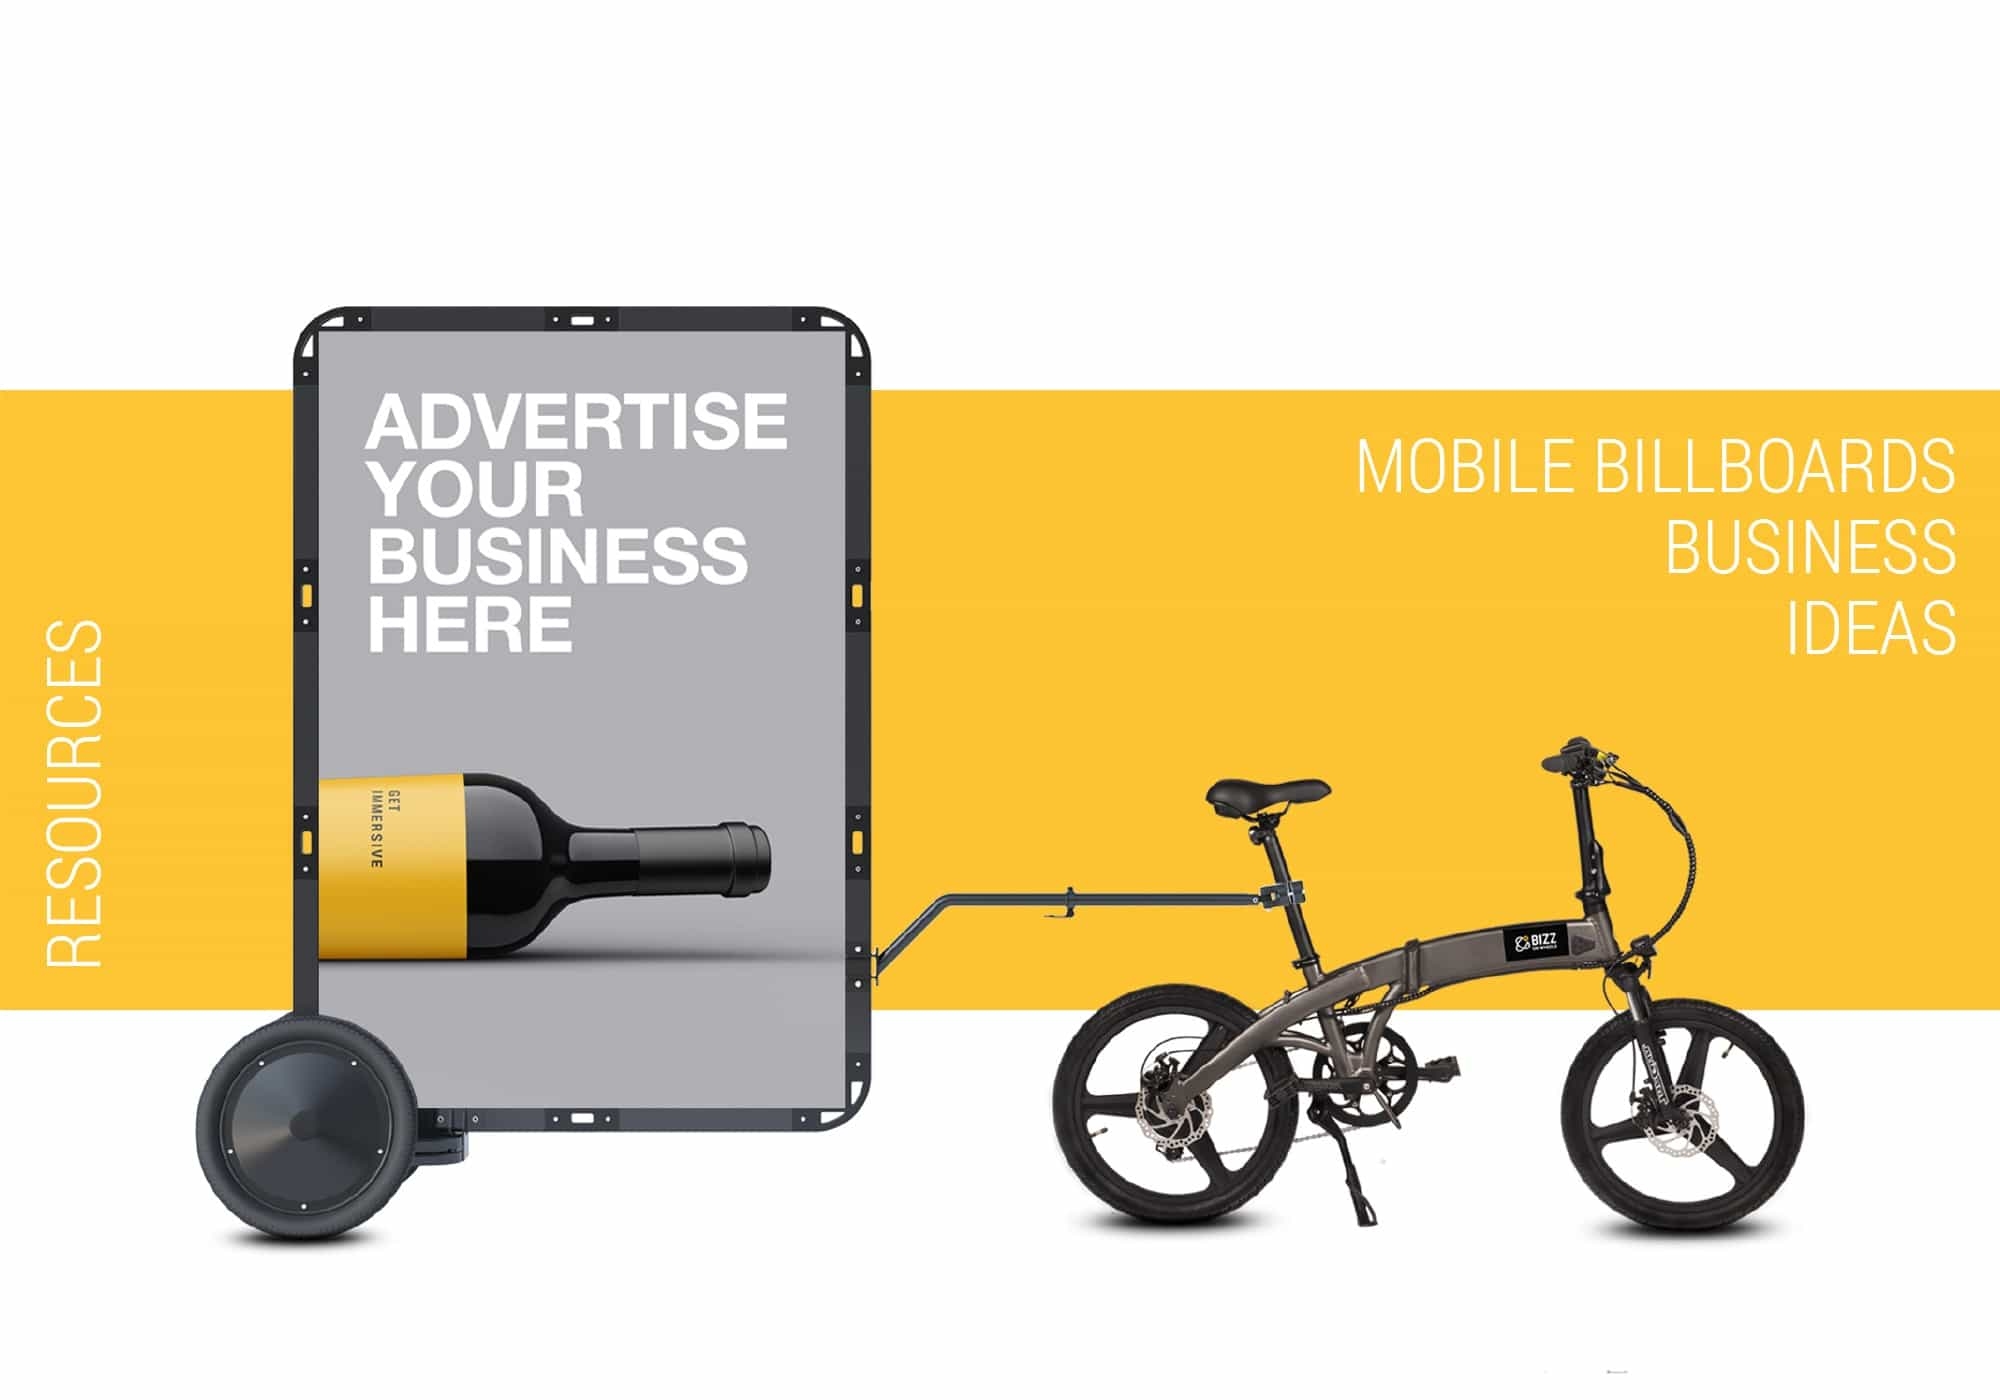 BizzOnWheels mobile billboards business ideas